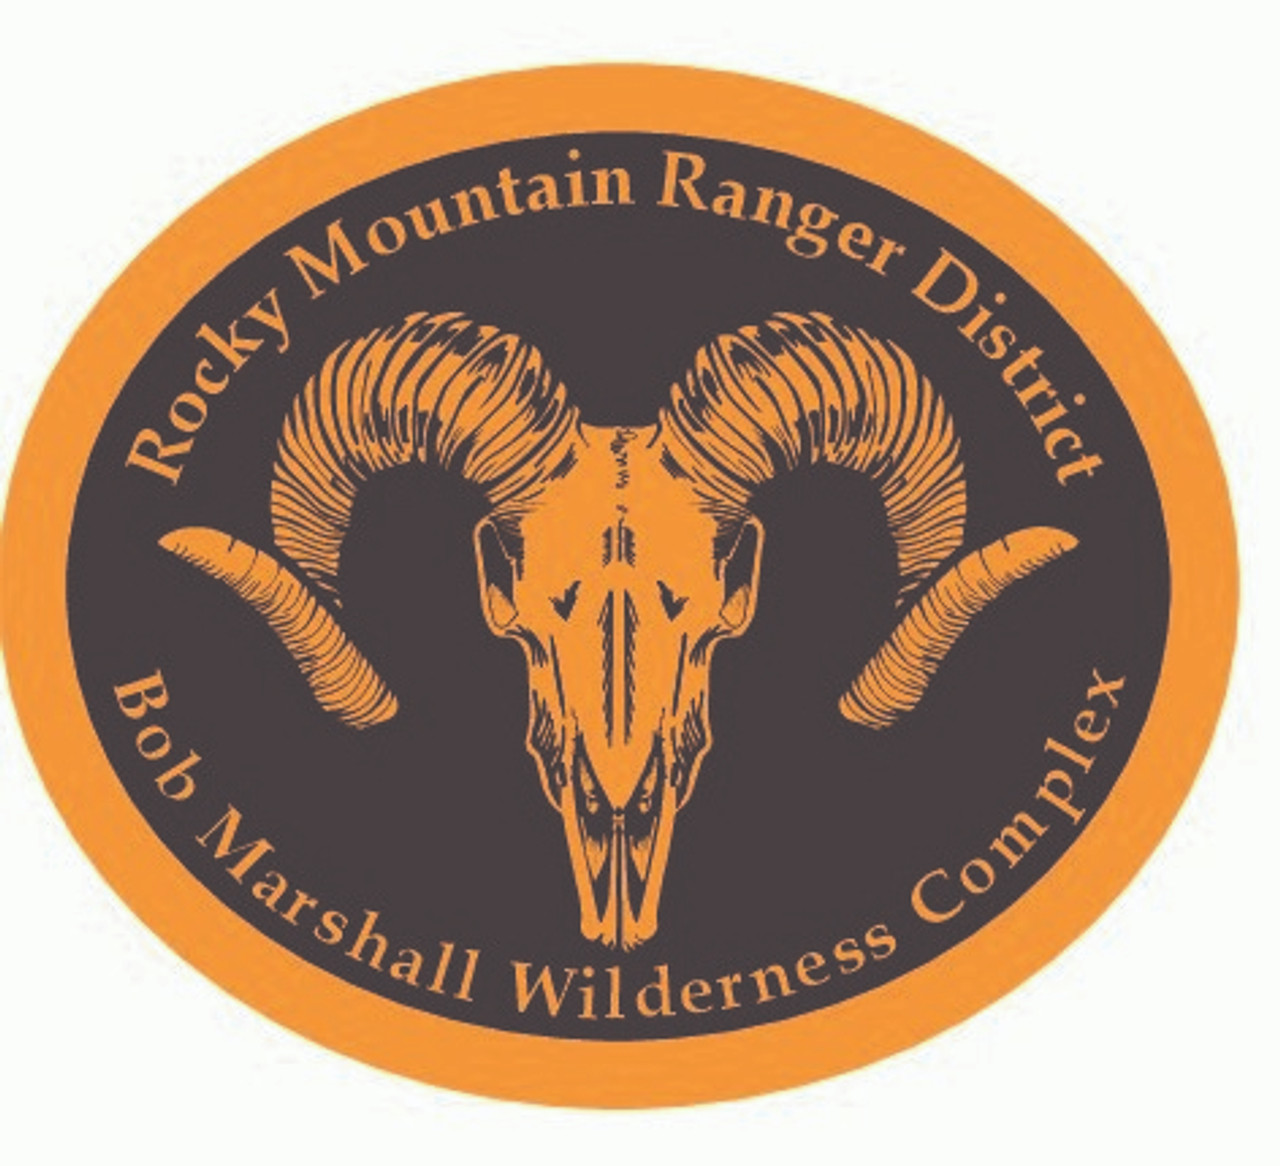 Rocky Mountain Ranger District Bob Marshall Wilderness Complex Buckle